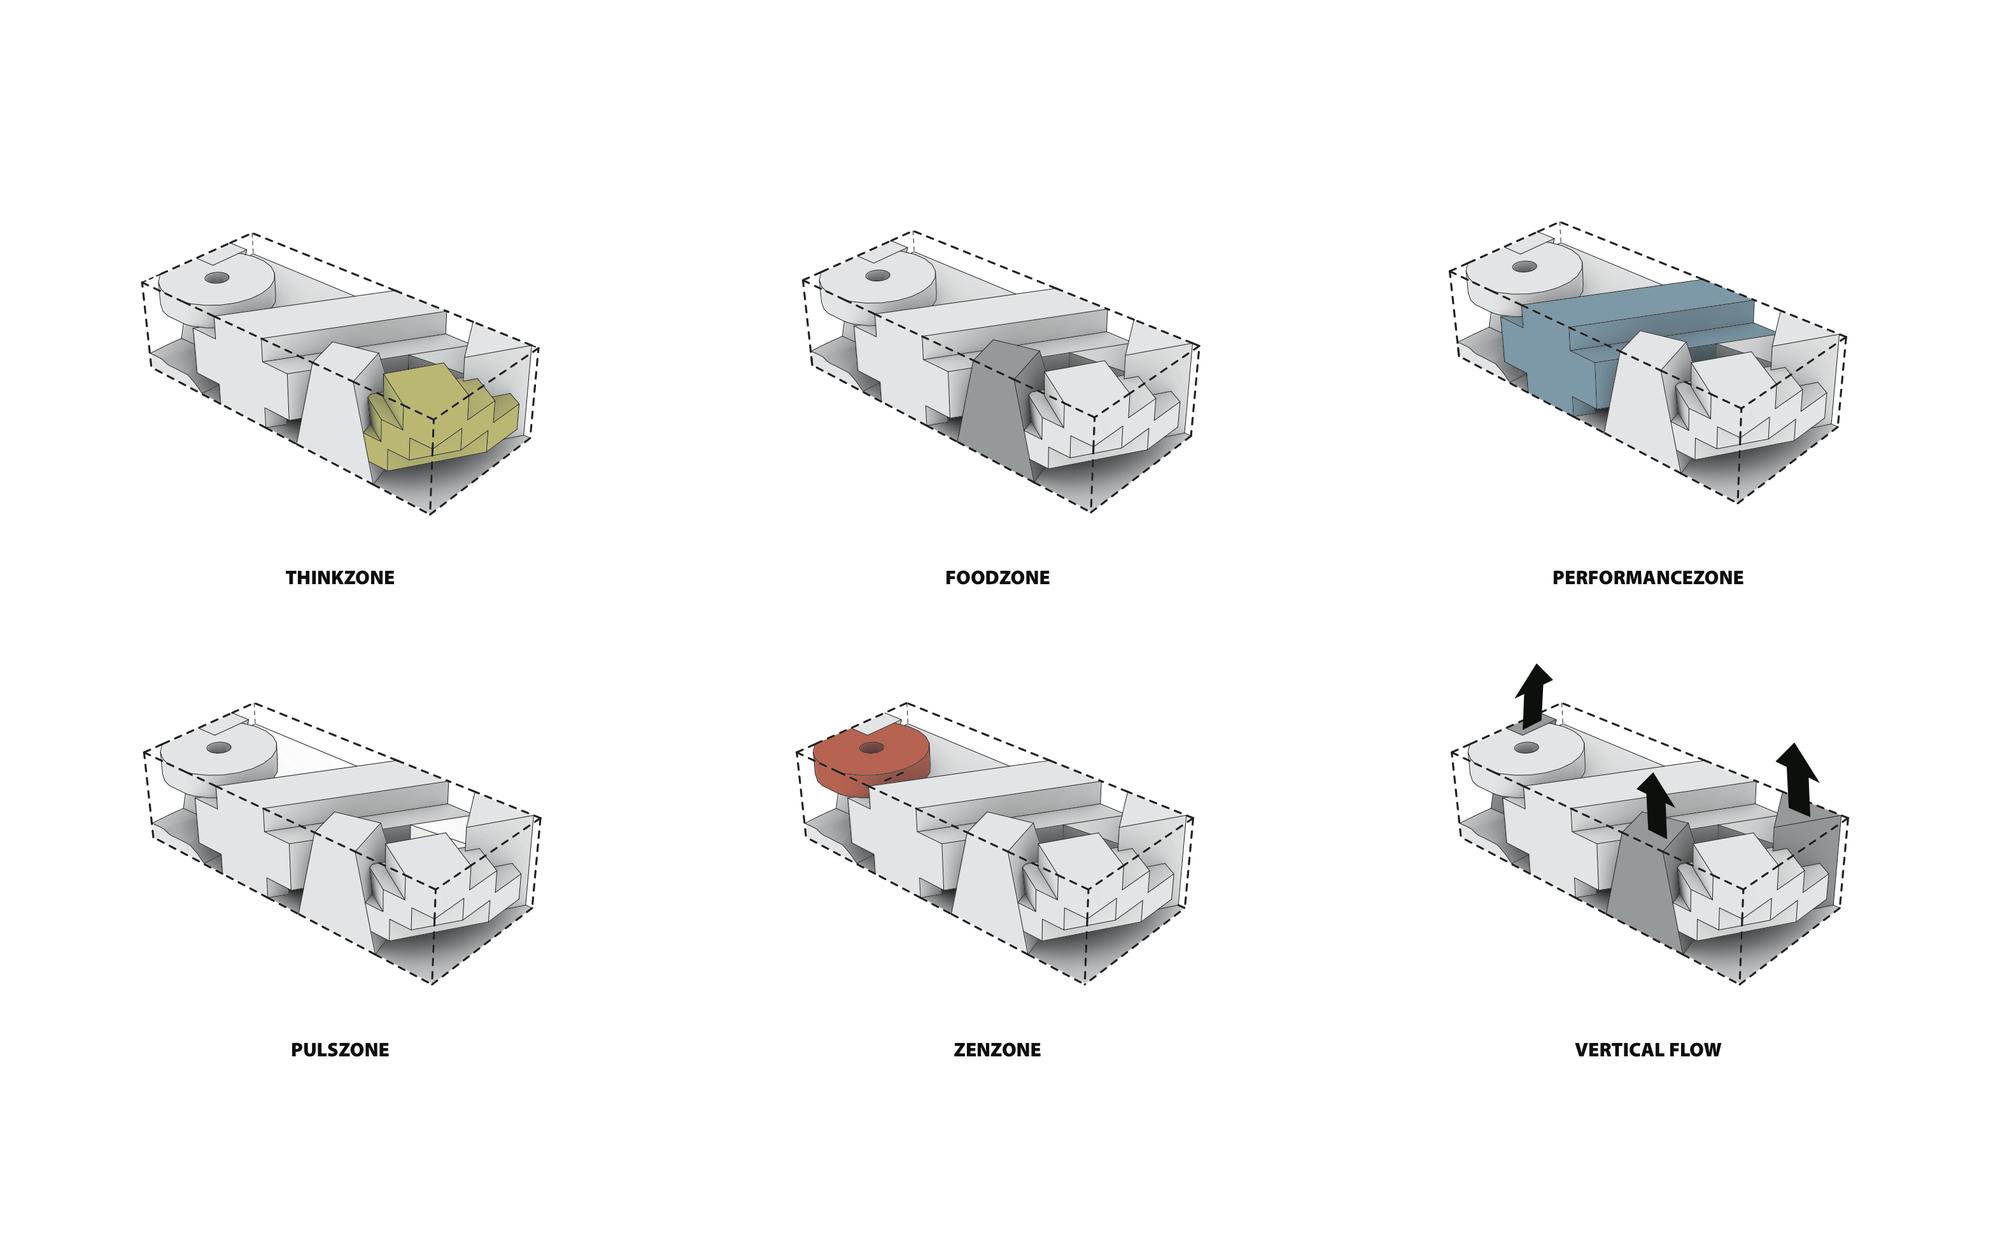 Galer a de casa de cultura en movimiento ku be mvrdv for Movement architecture concept